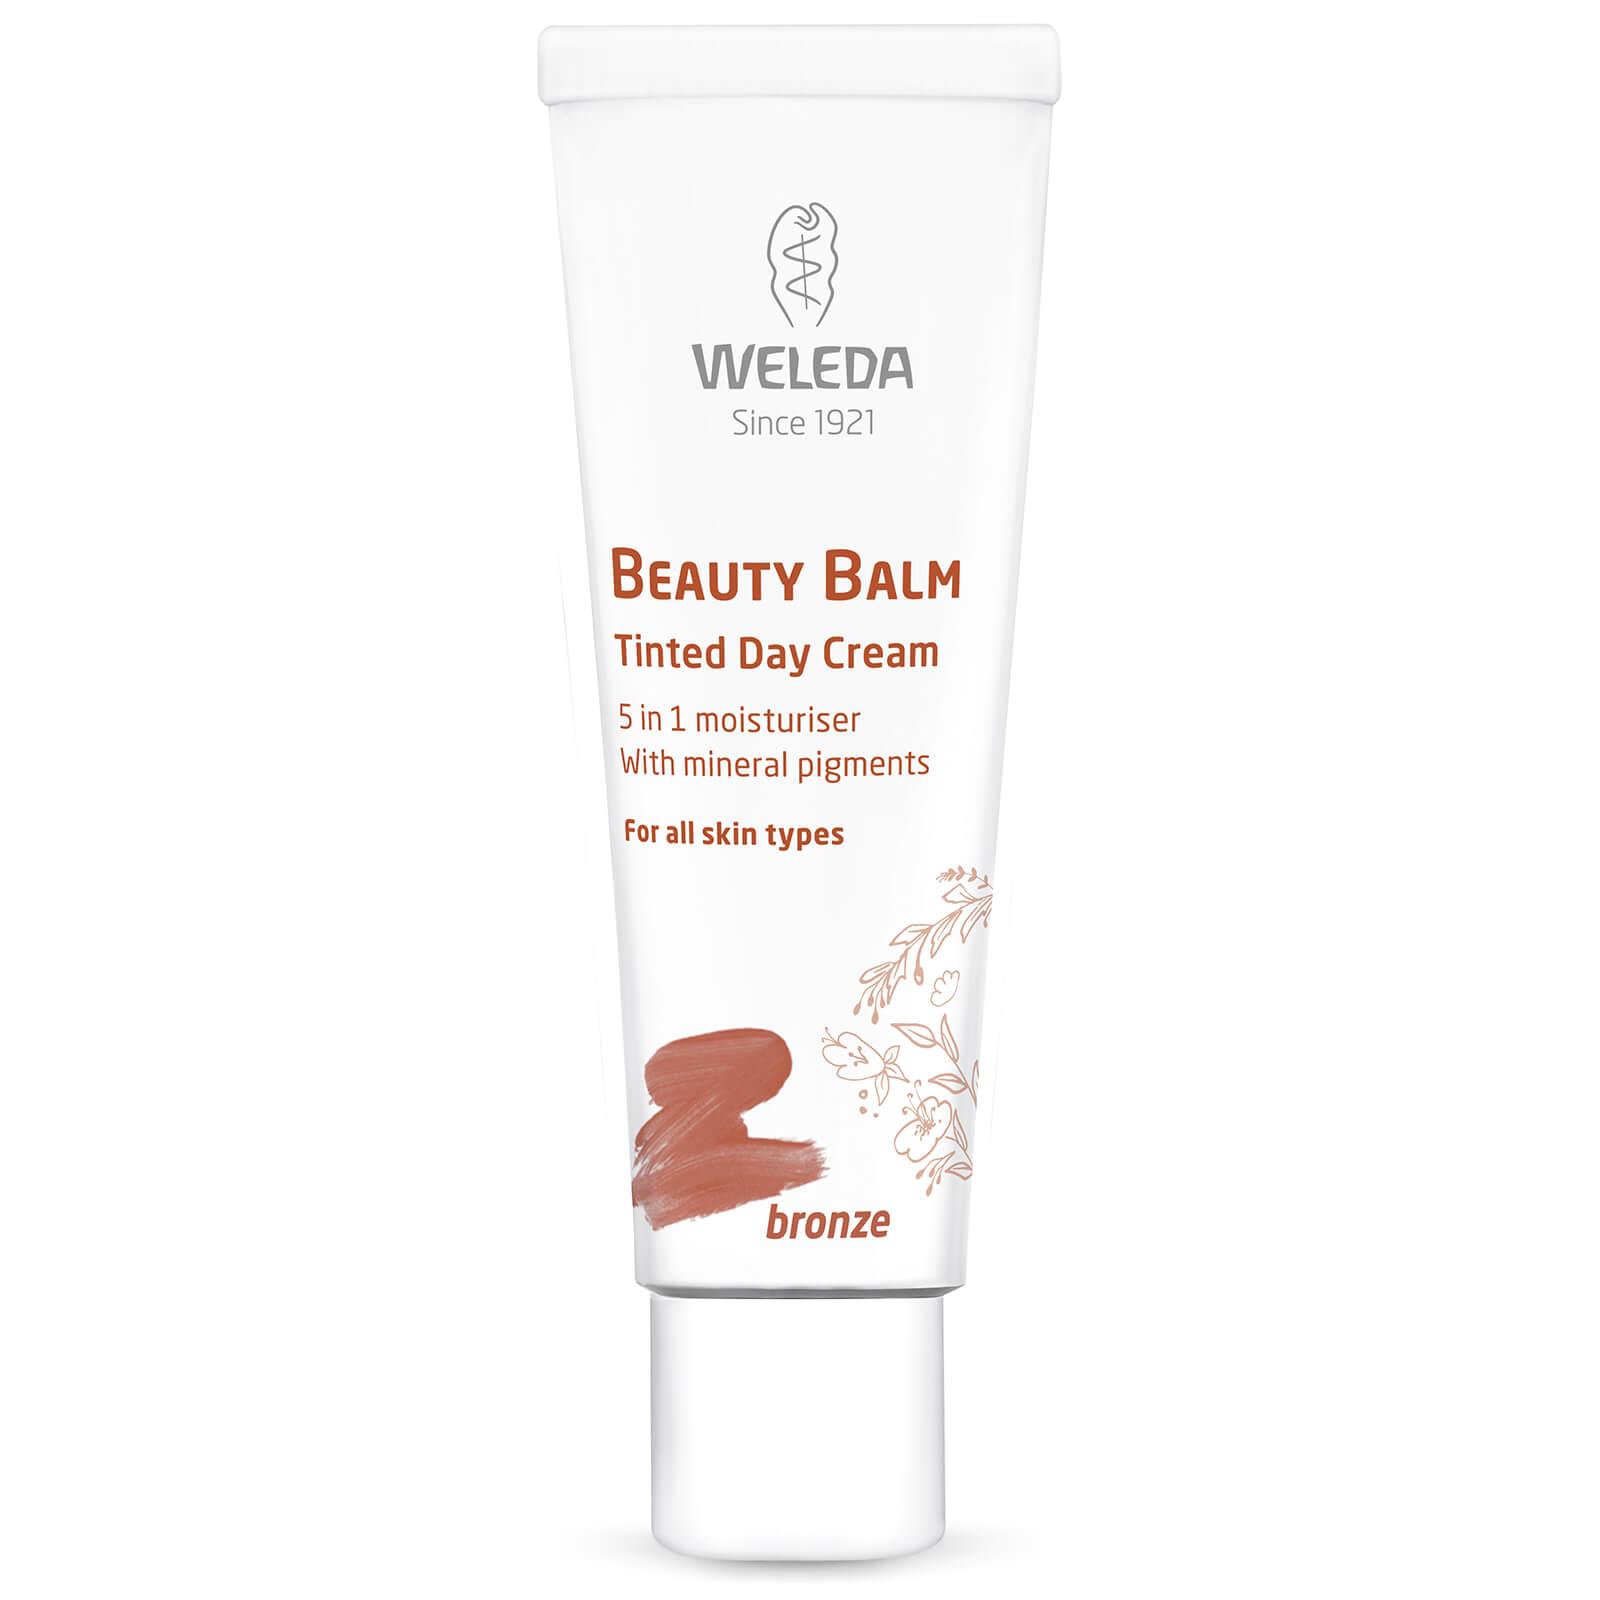 Купить Weleda Beauty Balm - Bronze 30ml